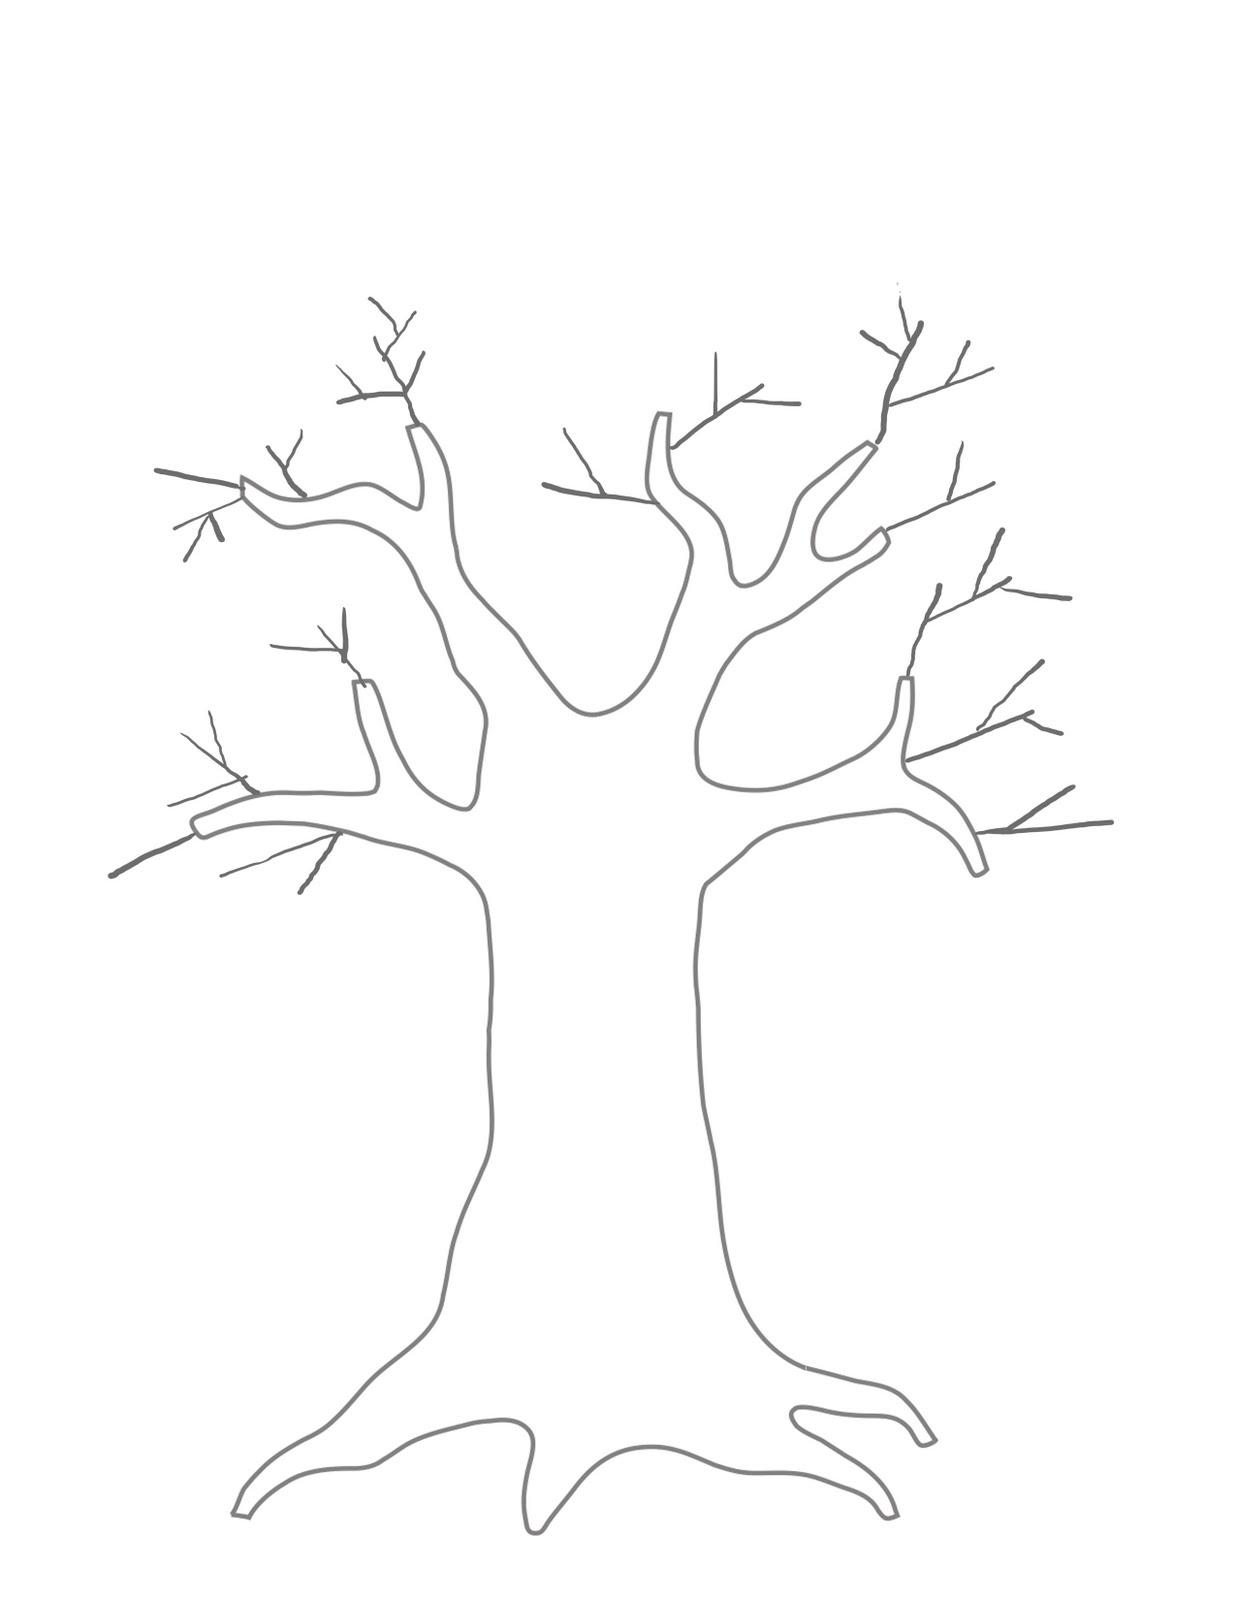 Kids Printable Family Tree